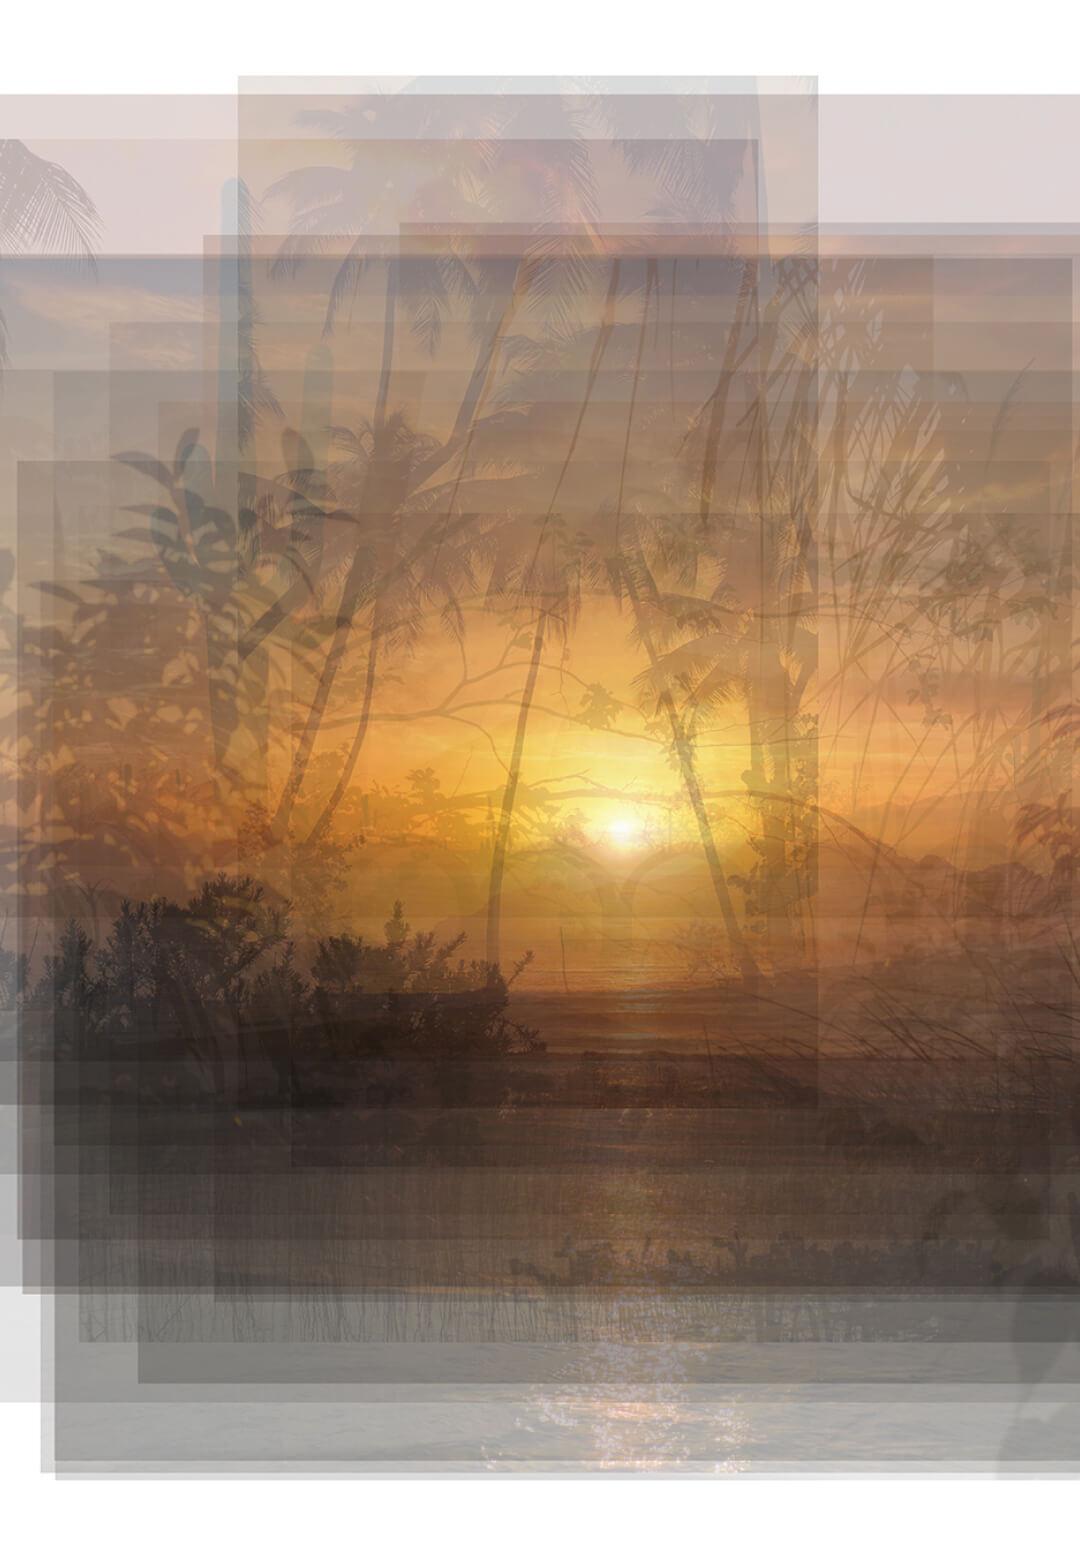 I Lift my Lamp, Beside the Golden Door (DACA)| Ghost of a Dream | STIRworld